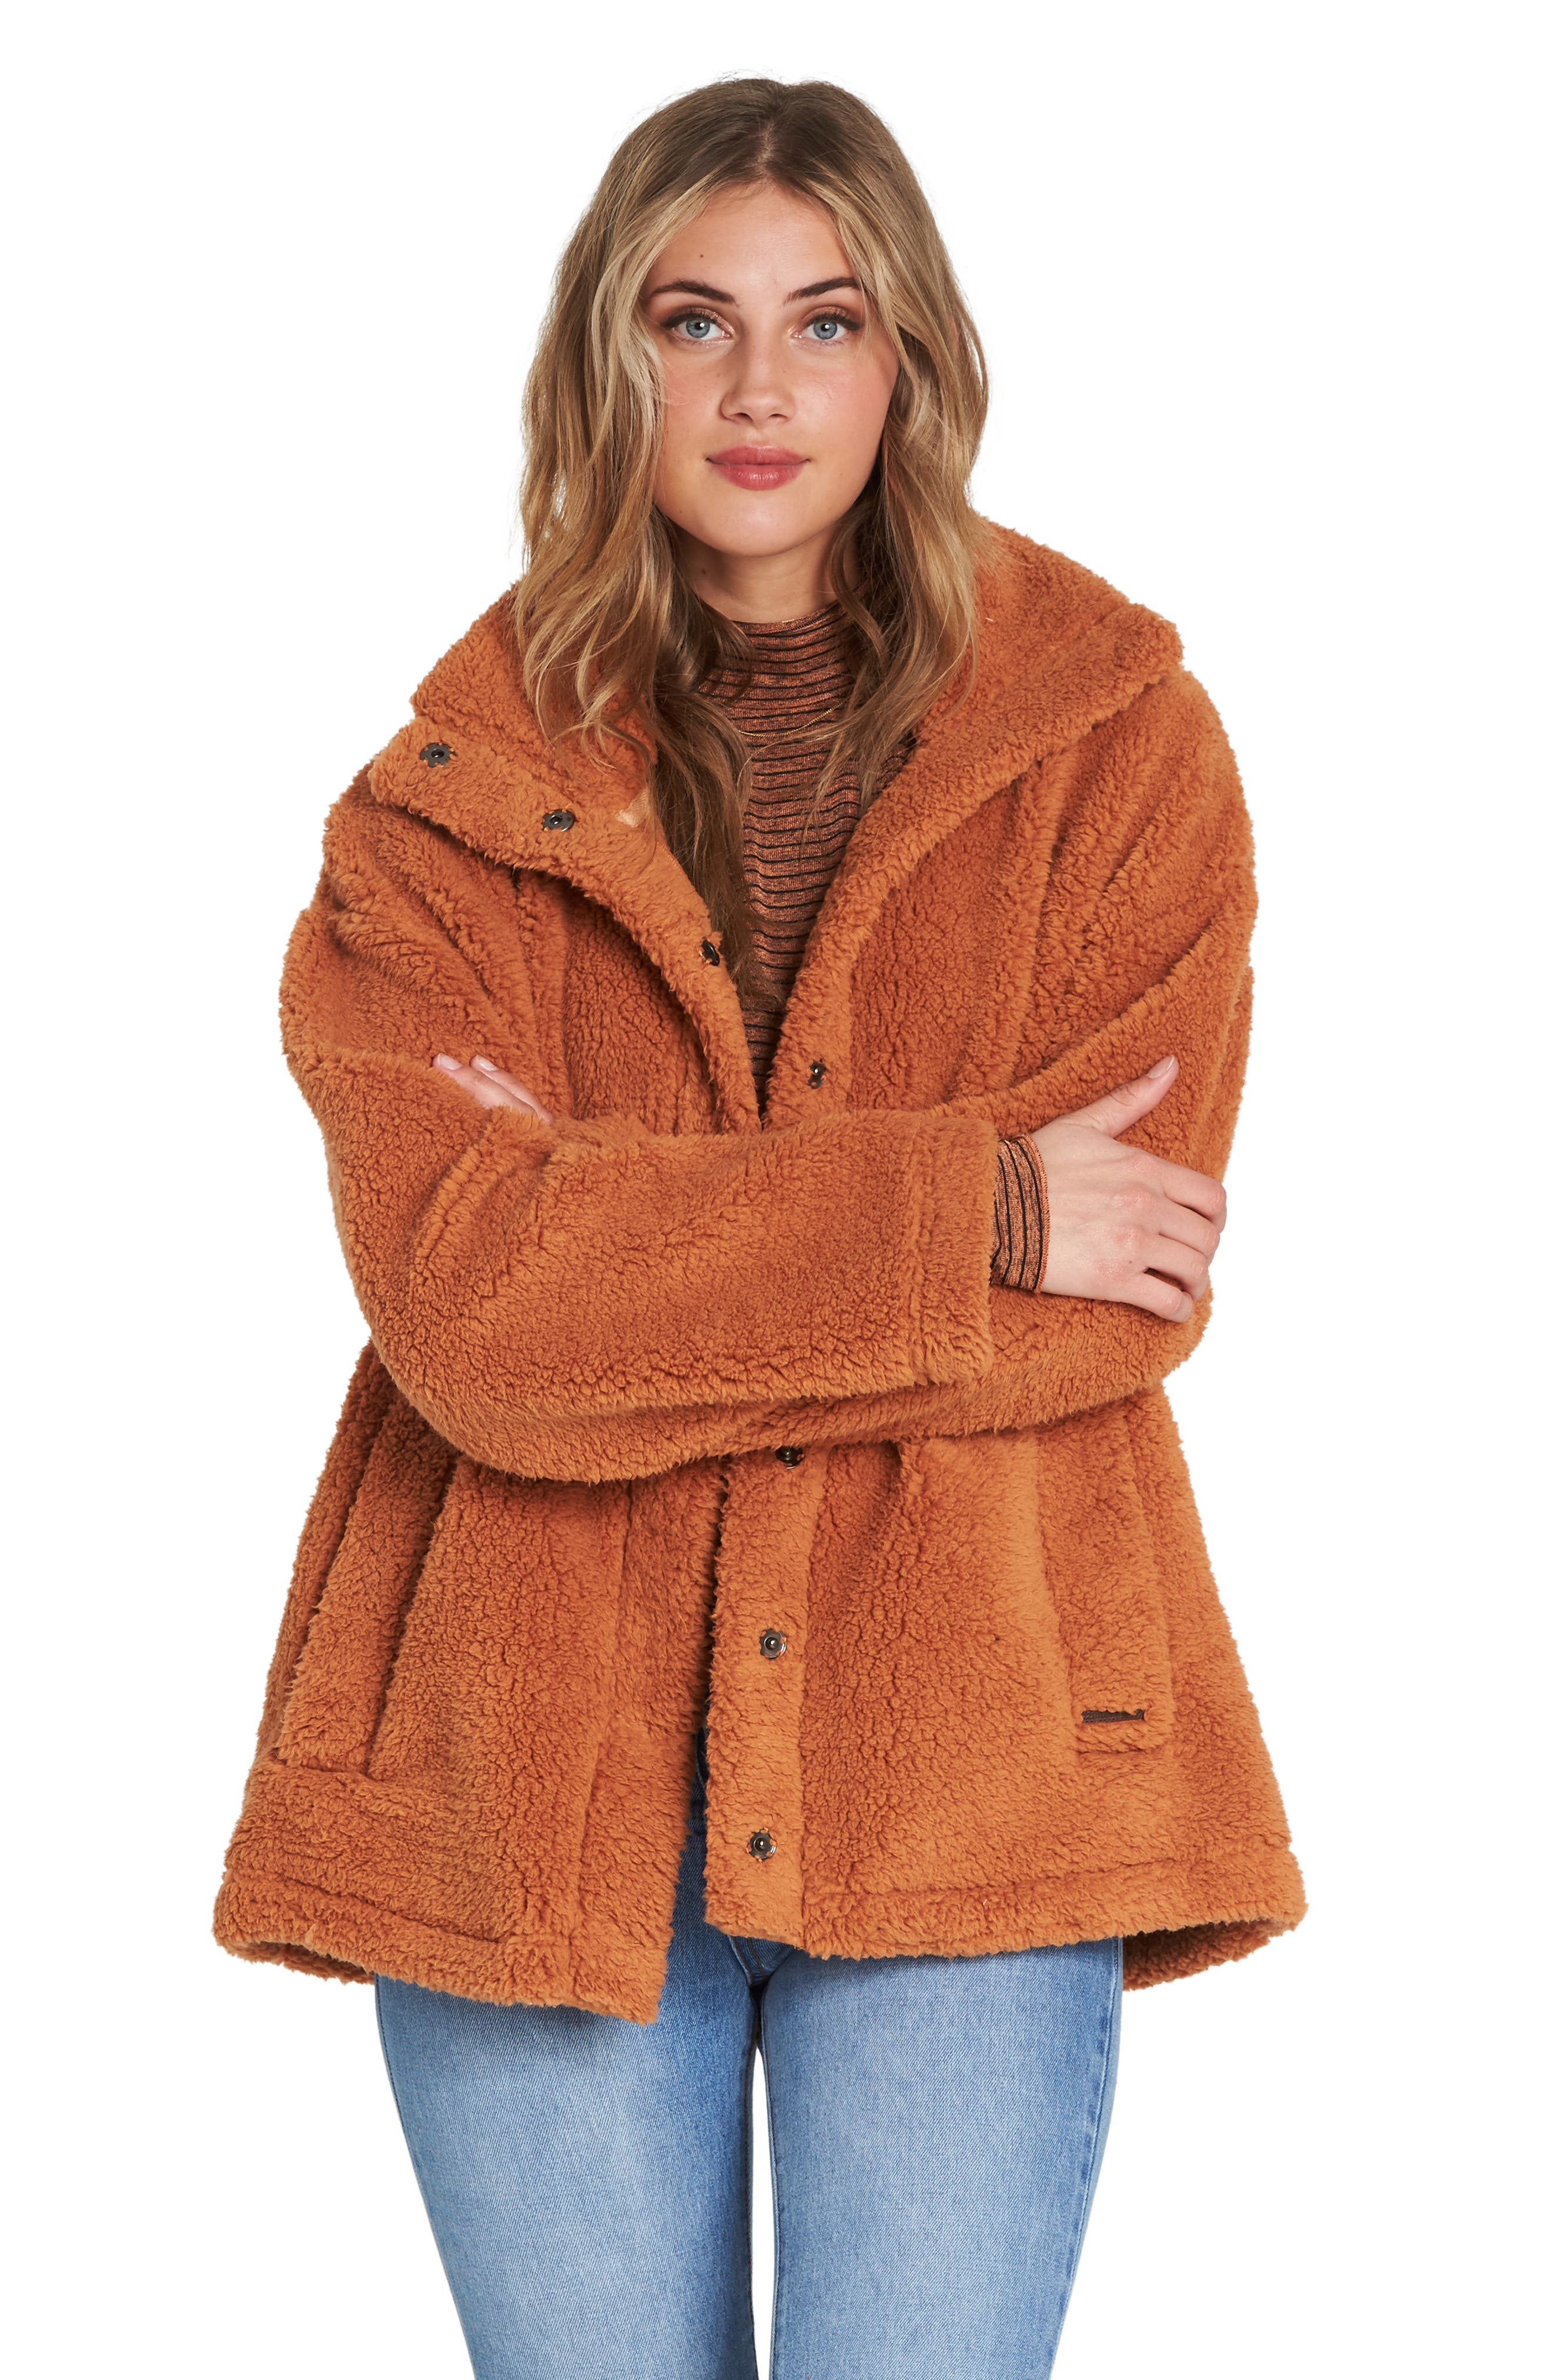 BILLABONG, Cozy Days Faux Fur Jacket, Alternate thumbnail 4, color, TOFFEE